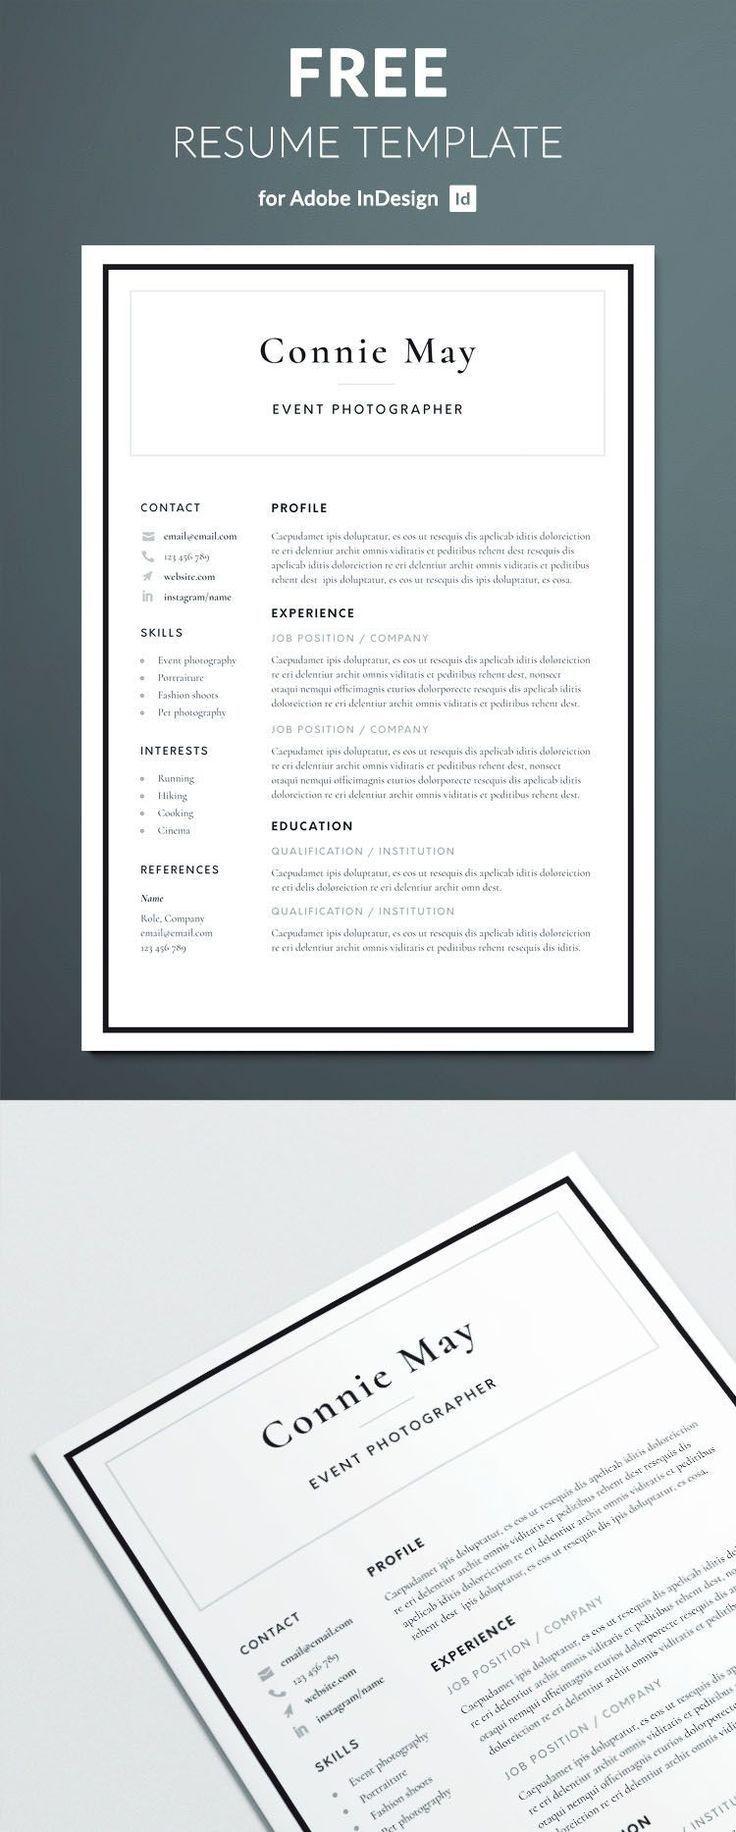 Resume Design Template Free Simple Resume Template Resume Design Free R Resume Design Template Free Free Resume Template Download Resume Template Free Indesign resume template free download